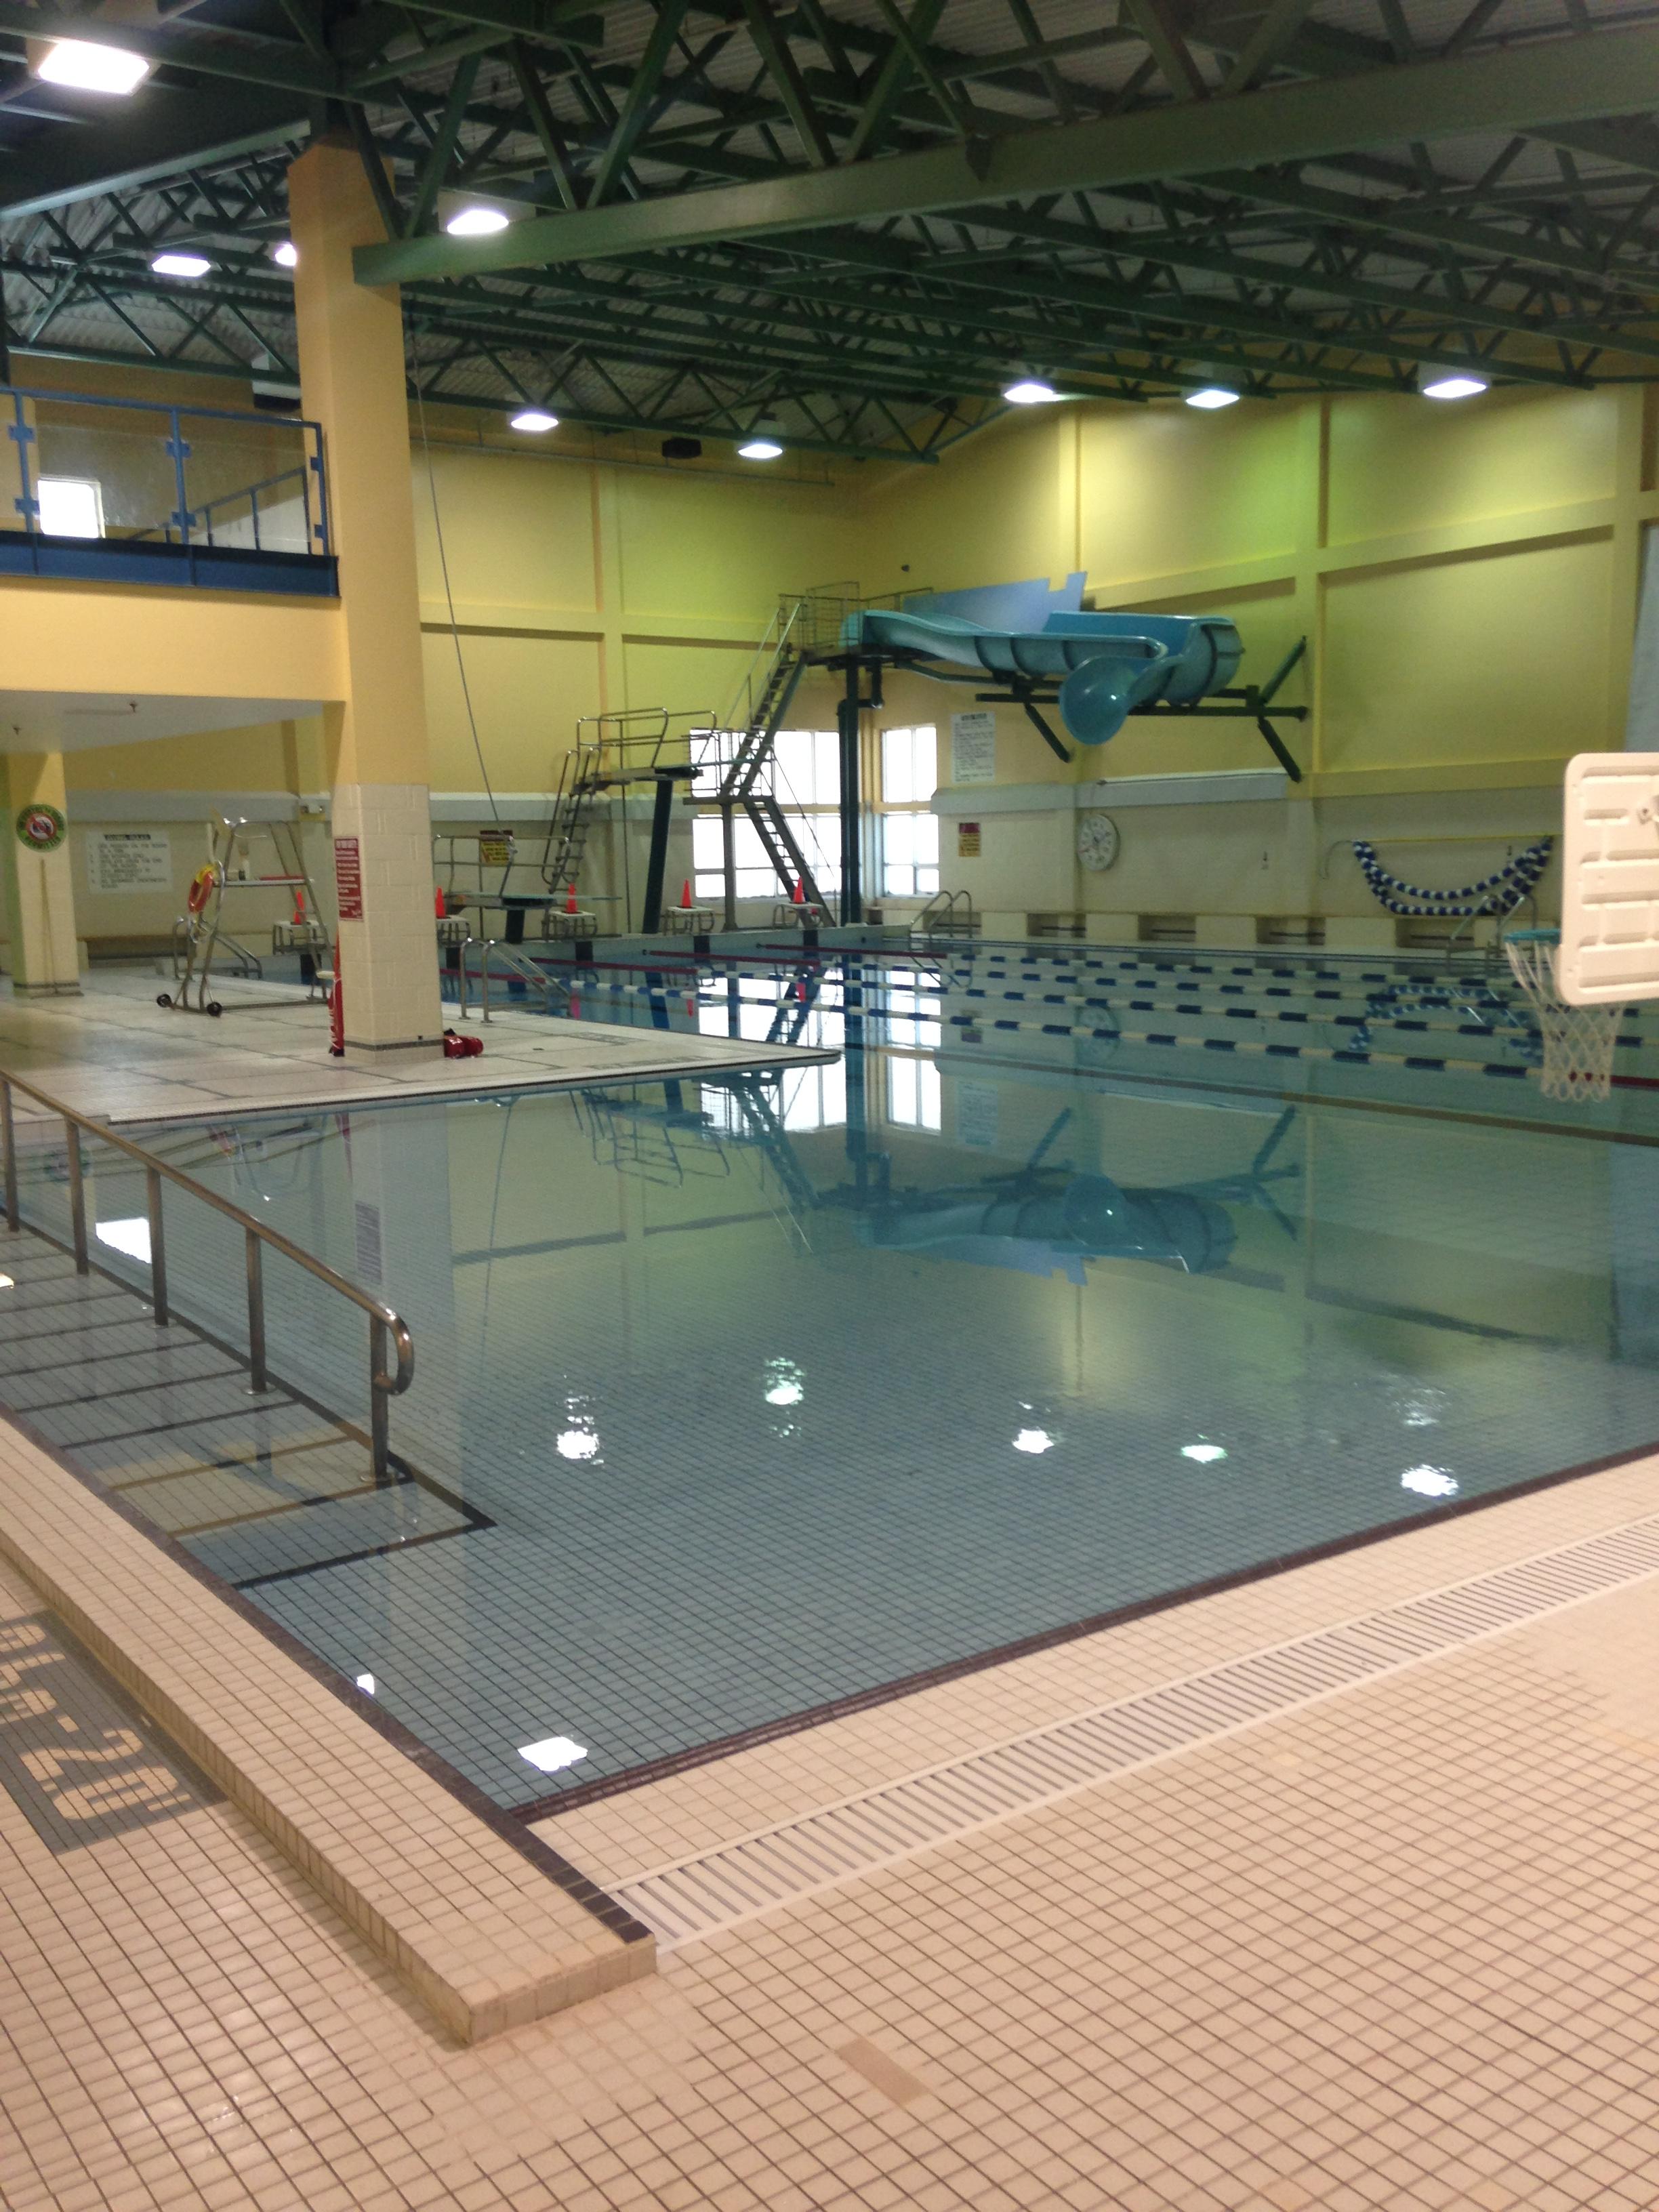 Ayr motor centre woodstock nb recreation - Woodstock swimming pool opening hours ...